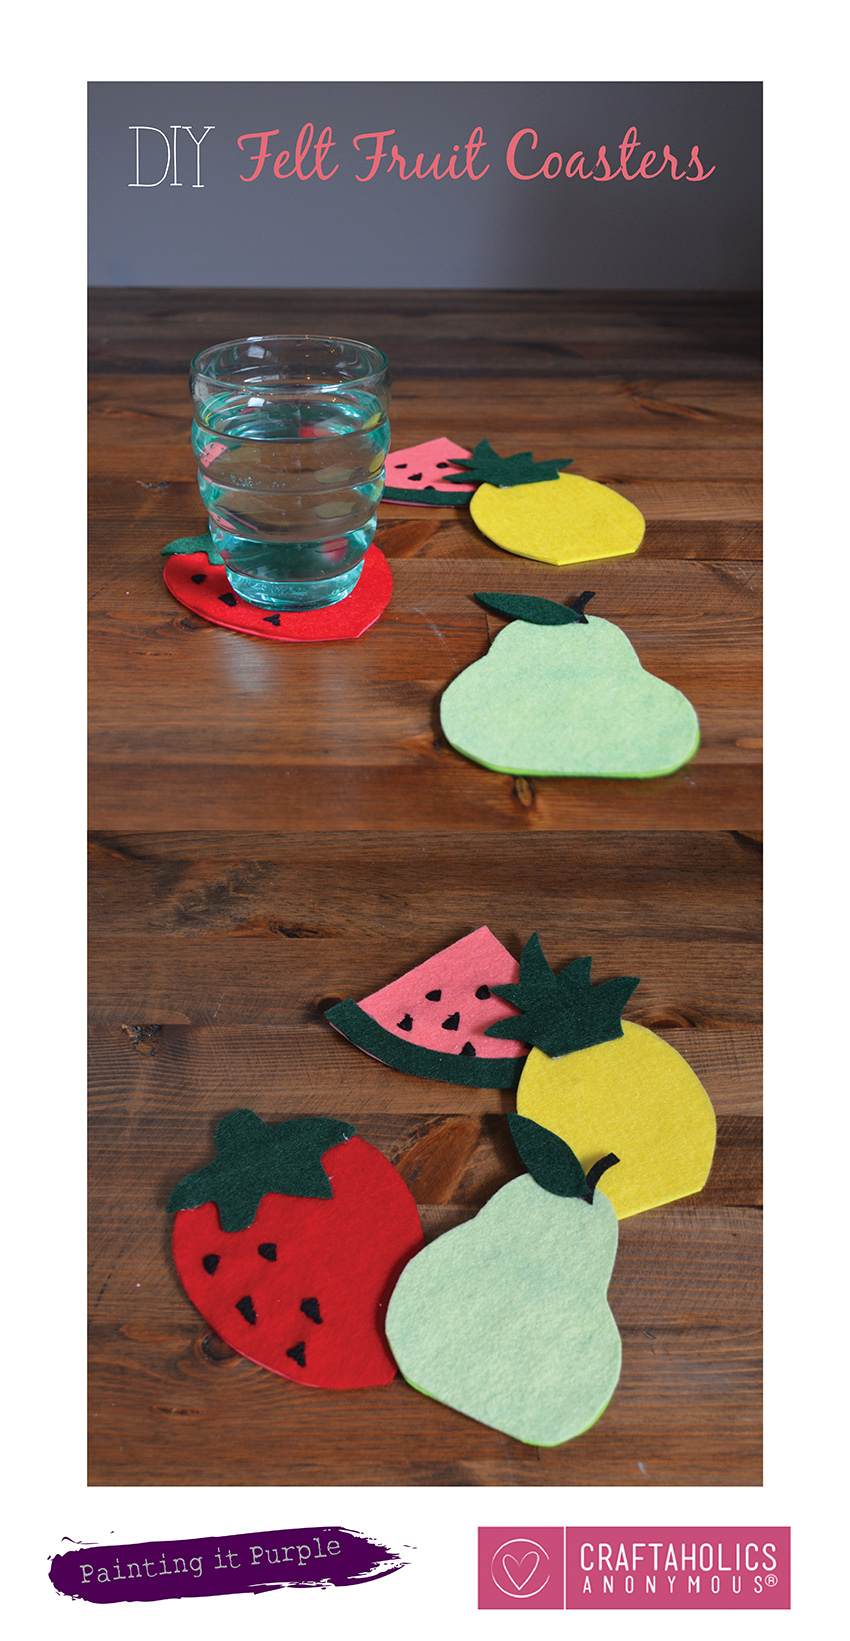 DIY Felt Fruit Coasters || Perfect summer craft!